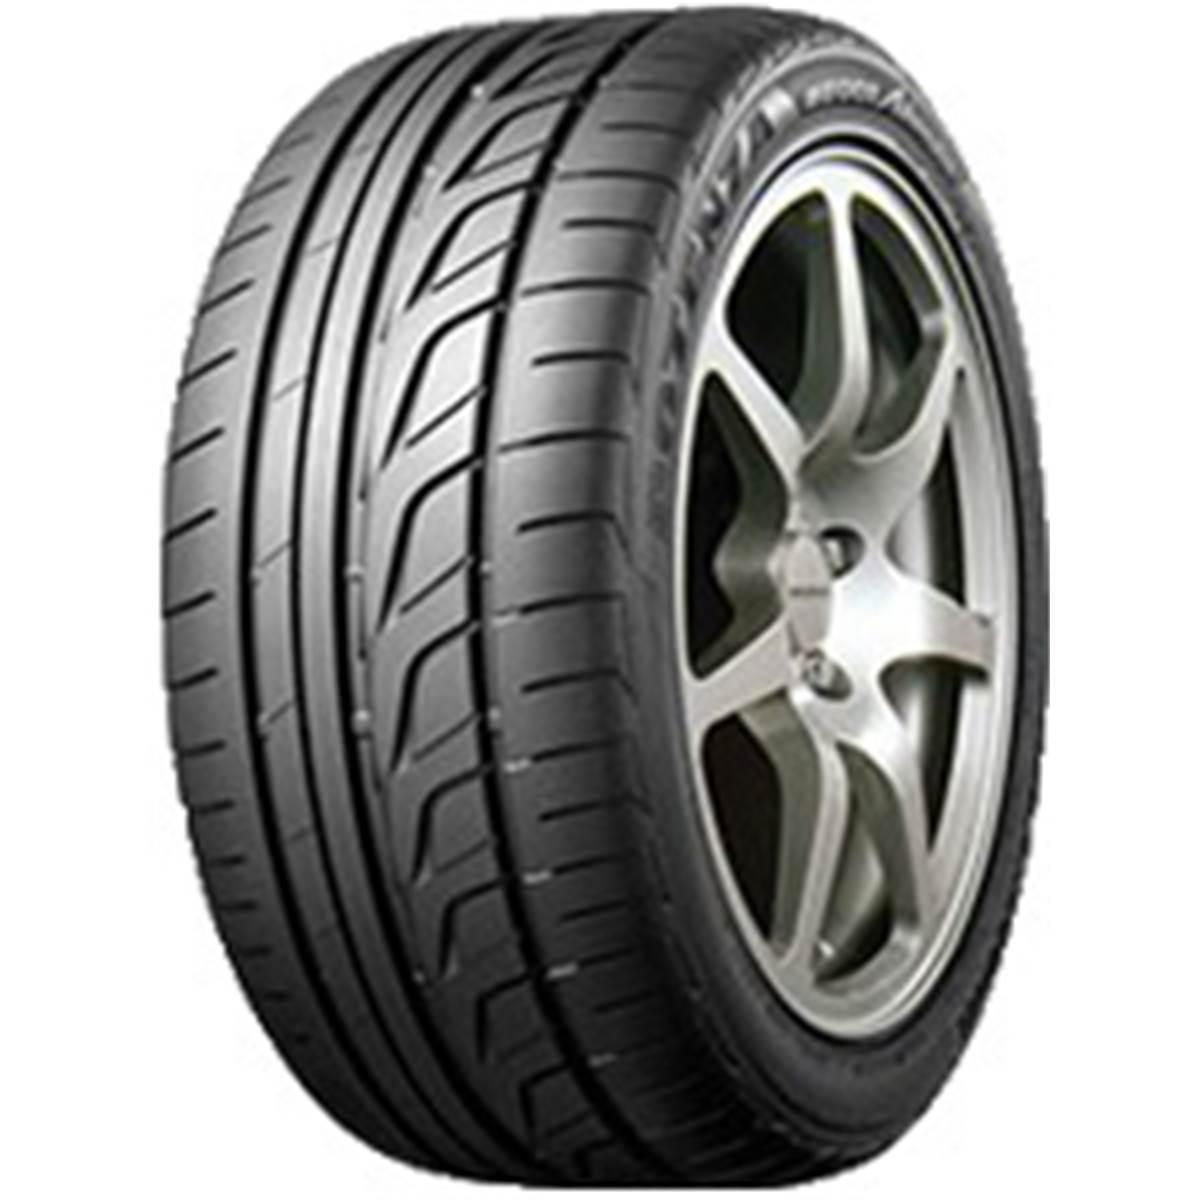 Pneu Bridgestone 195/55R15 85W POTENZA ADRENALIN RE002